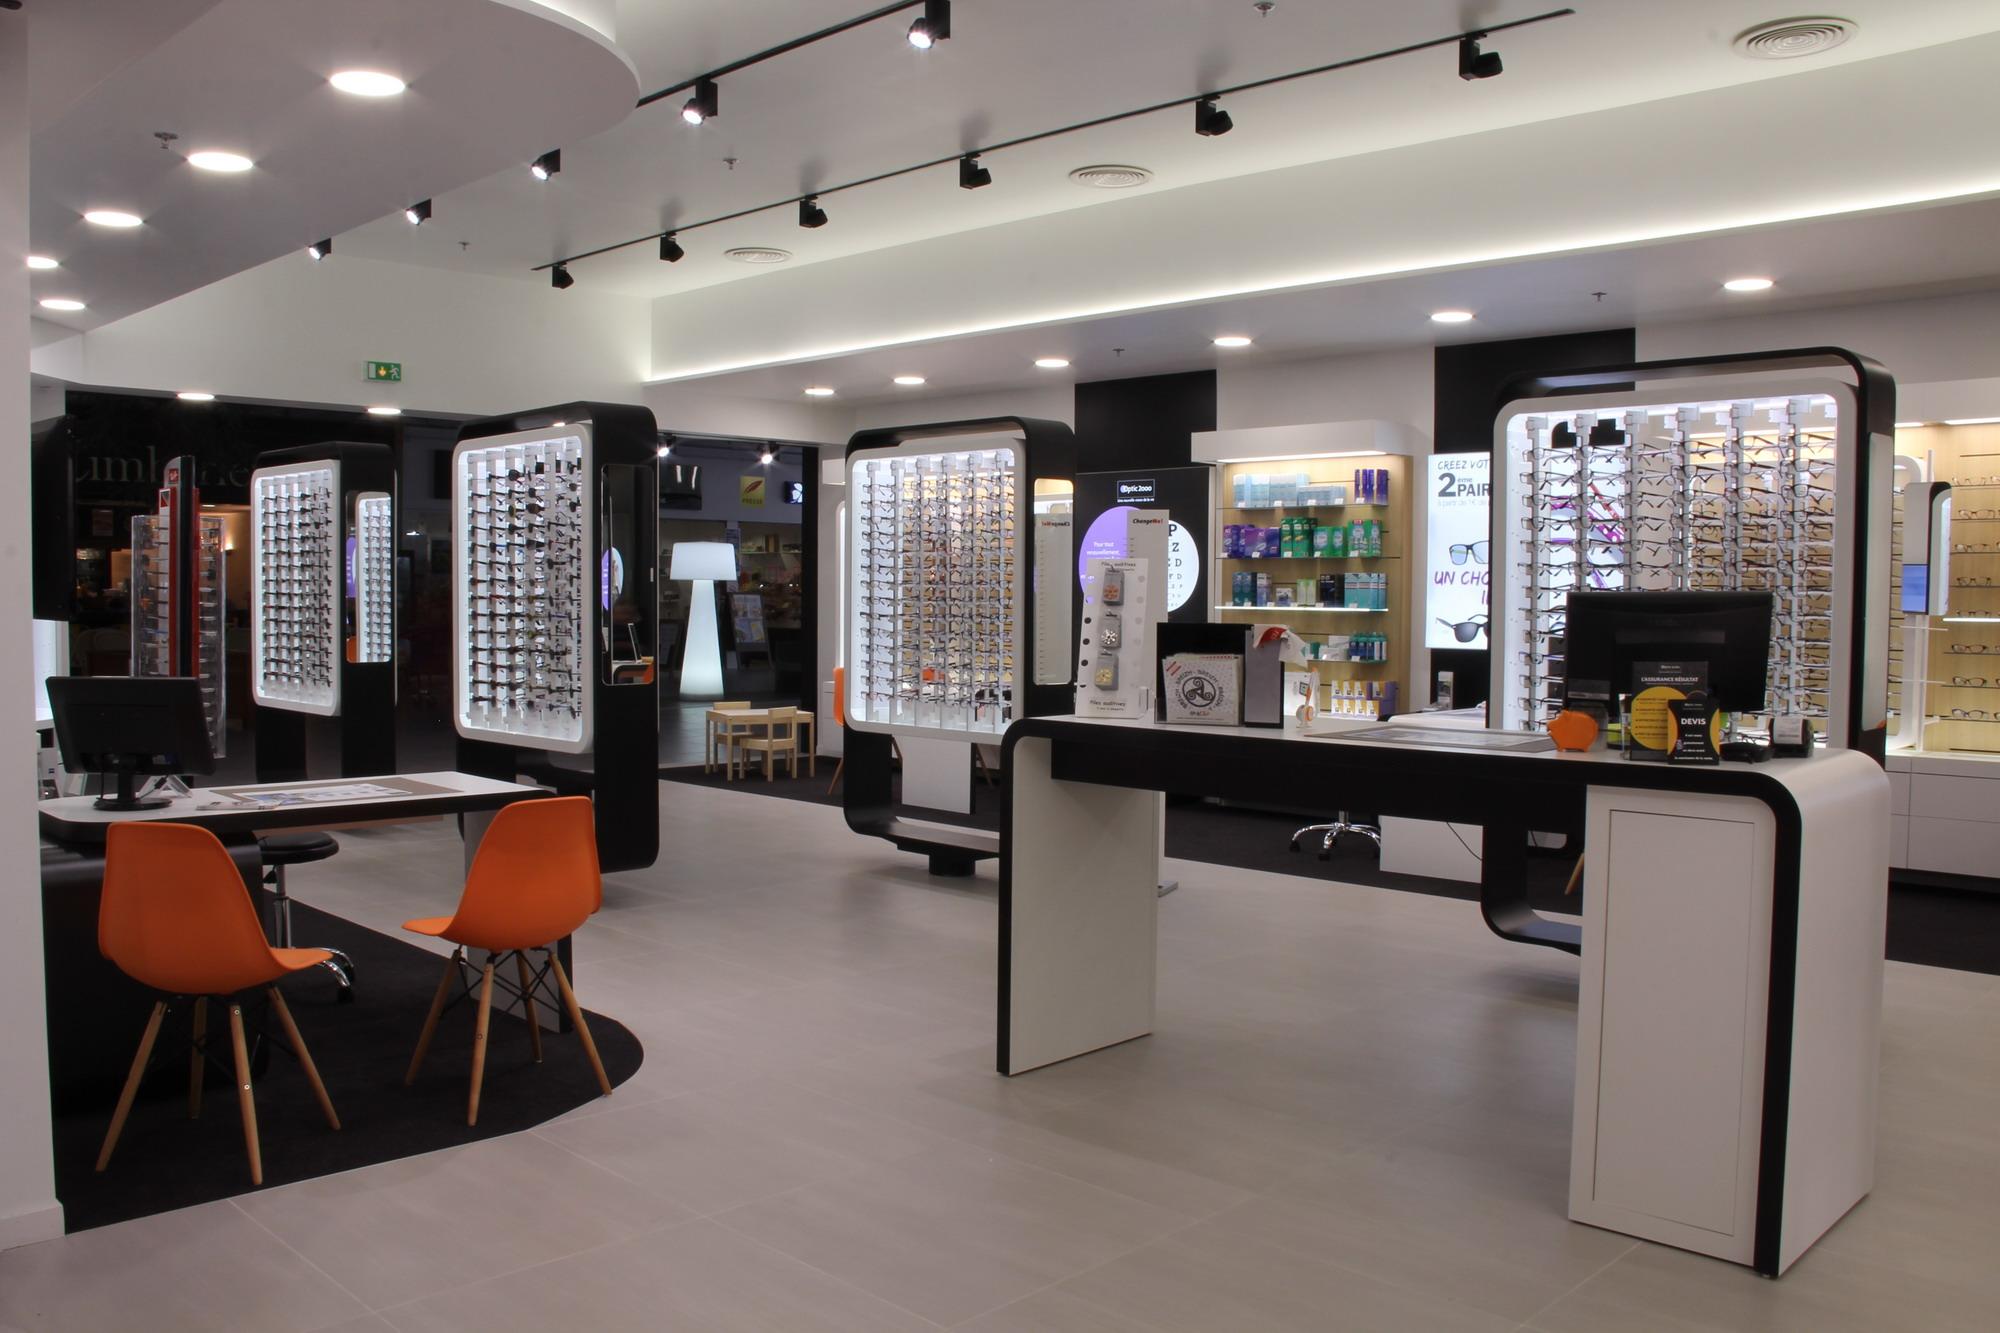 opticien saint malo 35400 lunettes femme lunettes homme optic 2000. Black Bedroom Furniture Sets. Home Design Ideas